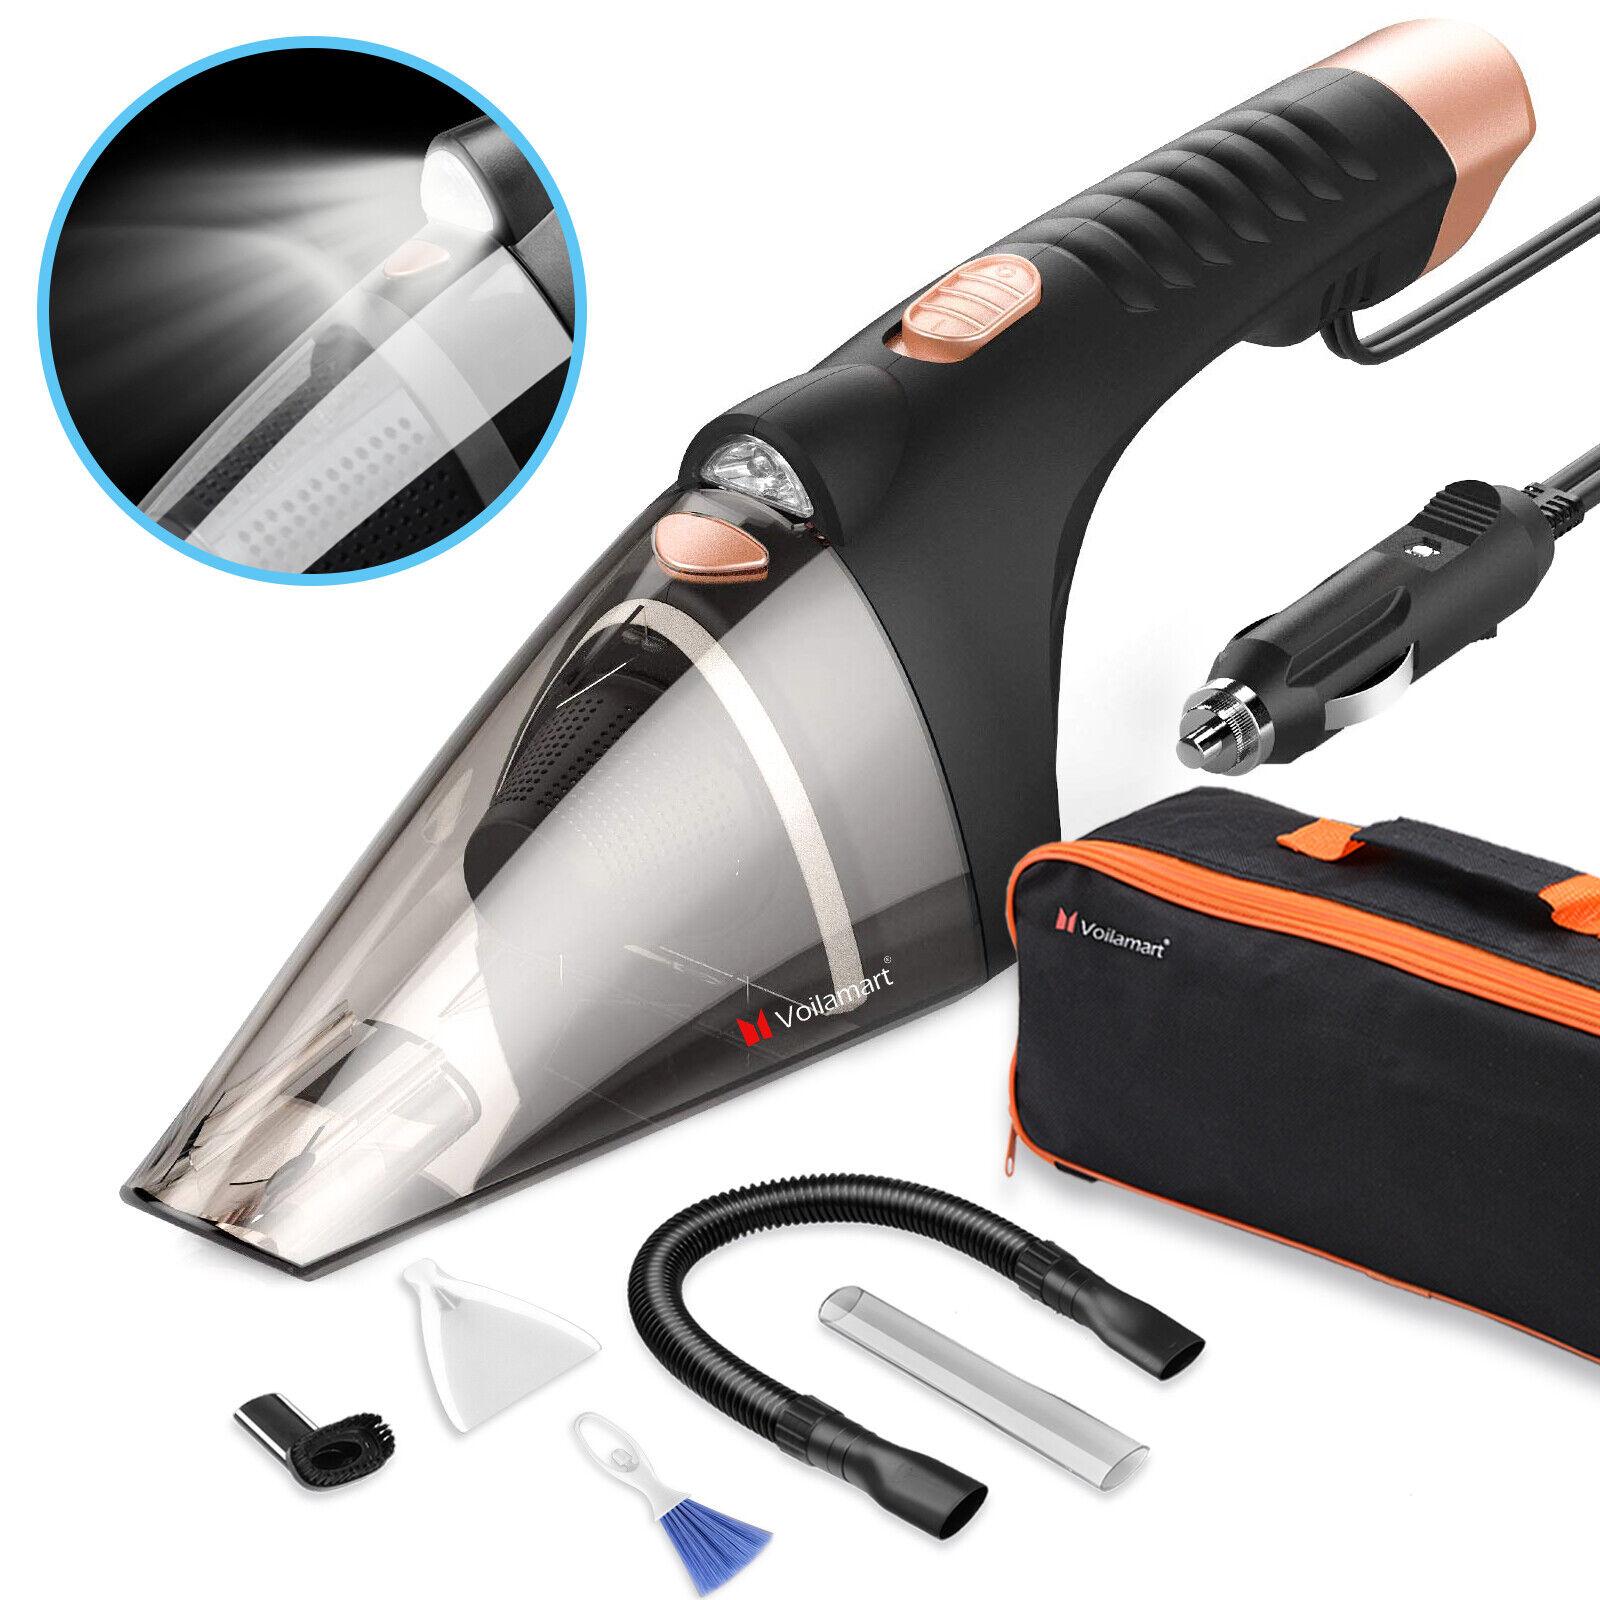 Mini Car Vacuum >> Car Vacuum Cleaner 12v Hand Held Auto Wet Dry Portable Handheld Mini Duster Dirt